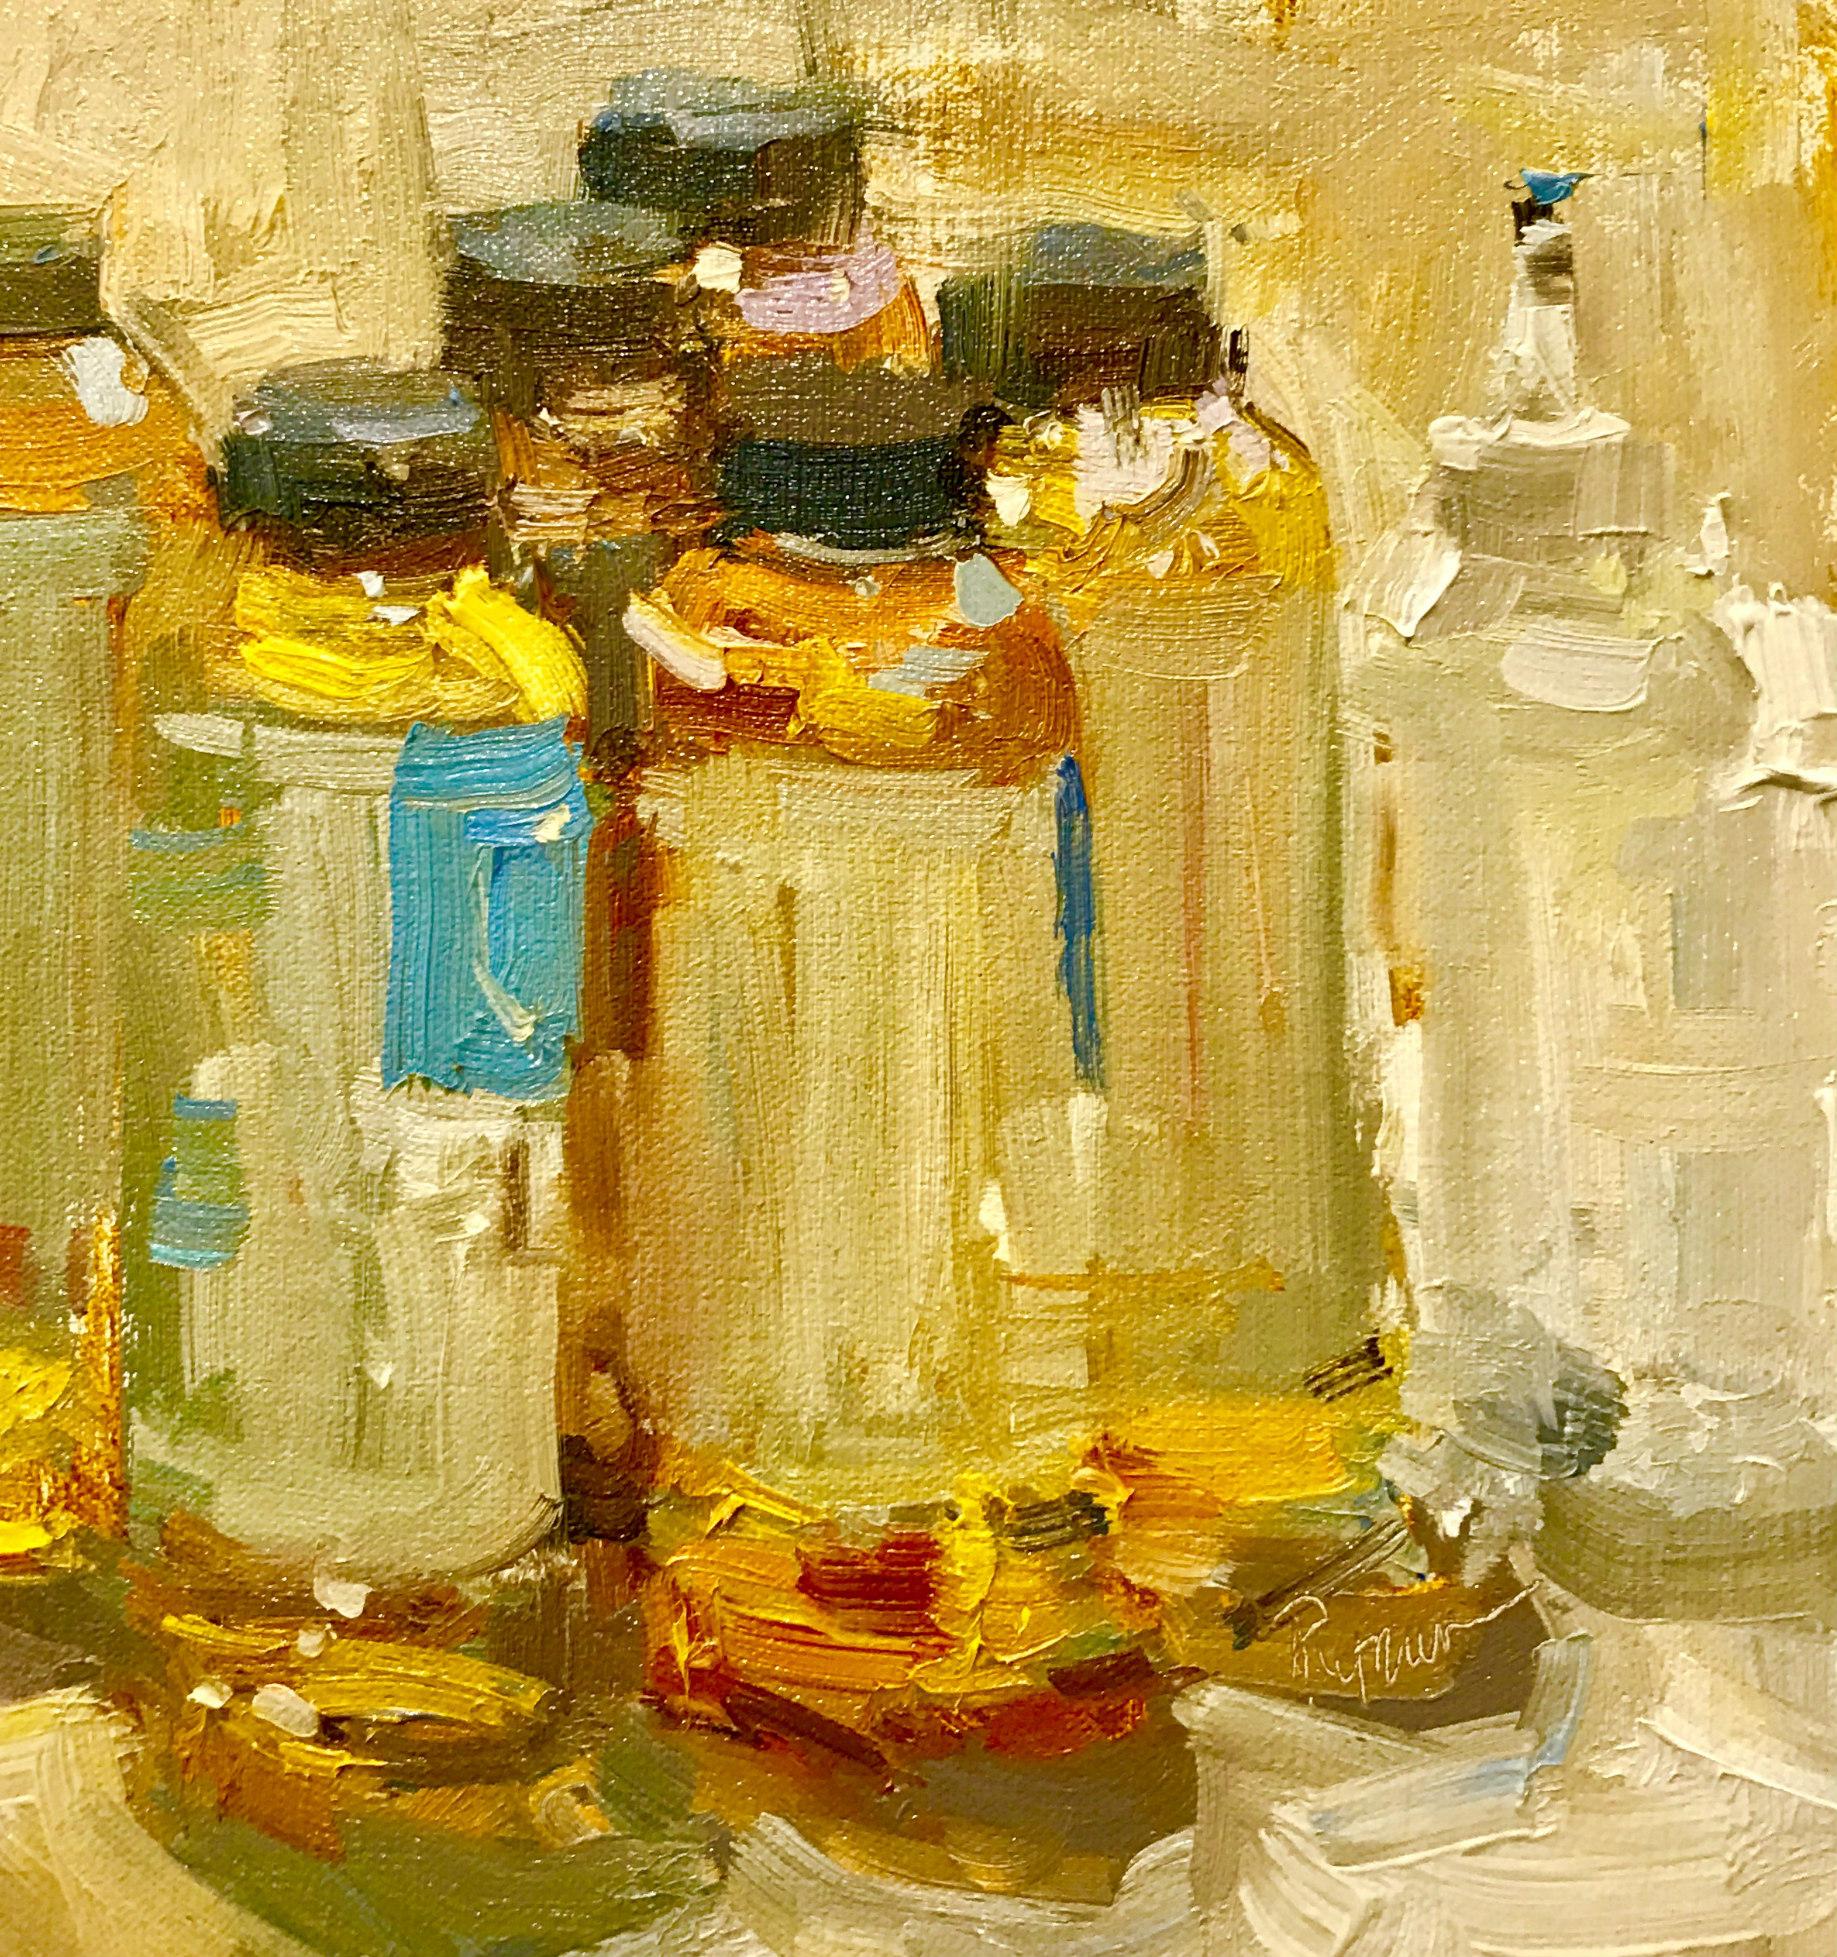 Detail, Gamblin Bottles, Oil on linen, Private Collection